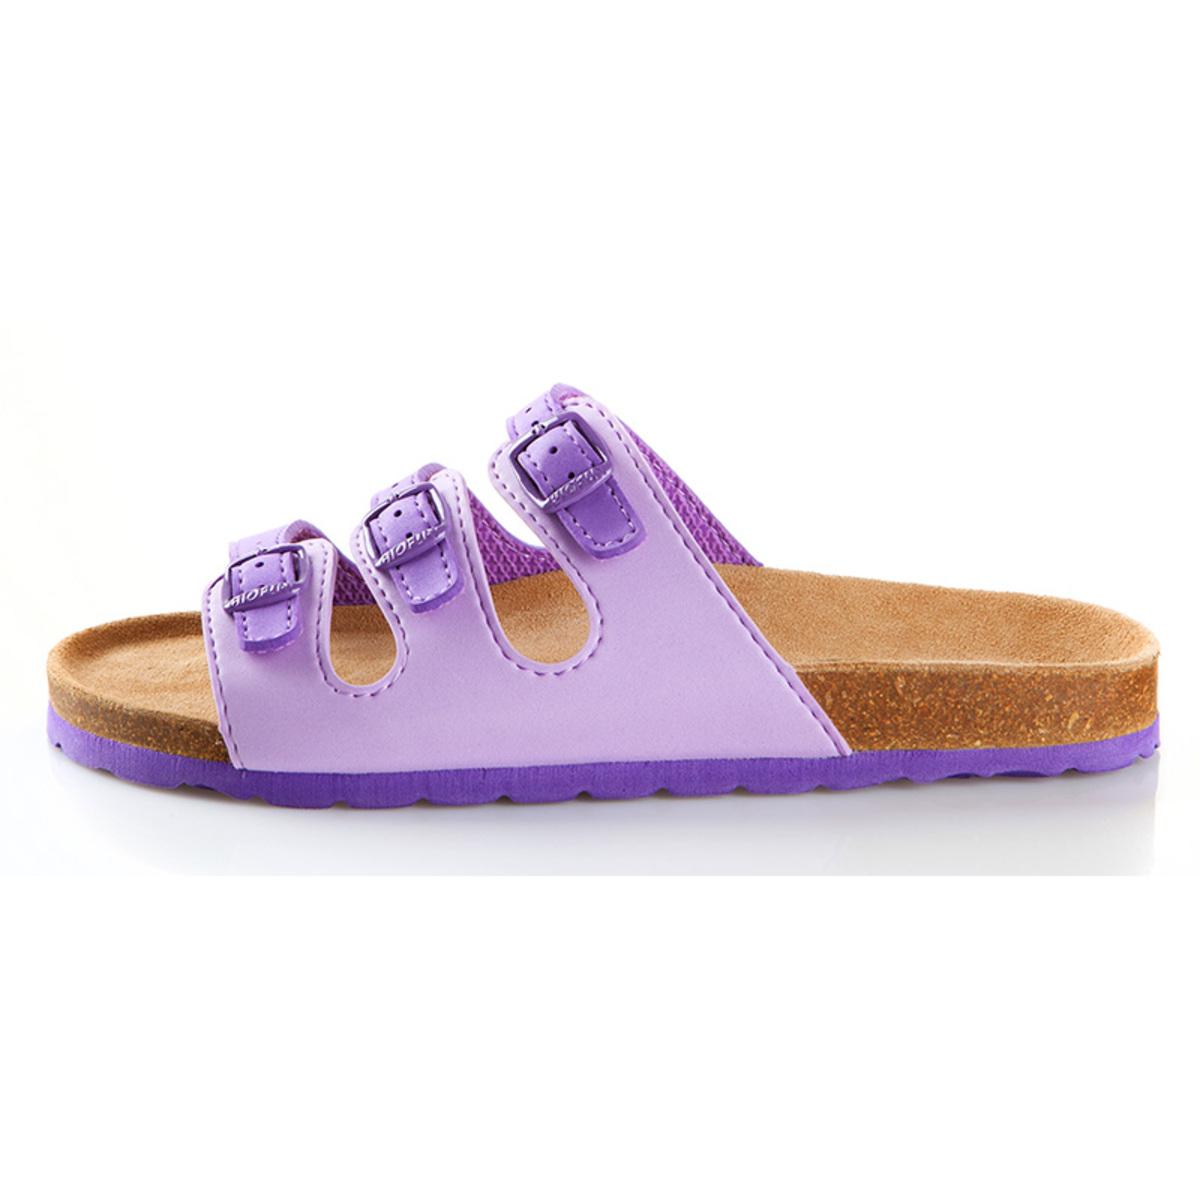 Bild 2 von BioFun Relaxing Footwear Tieffußbett-Pantoletten